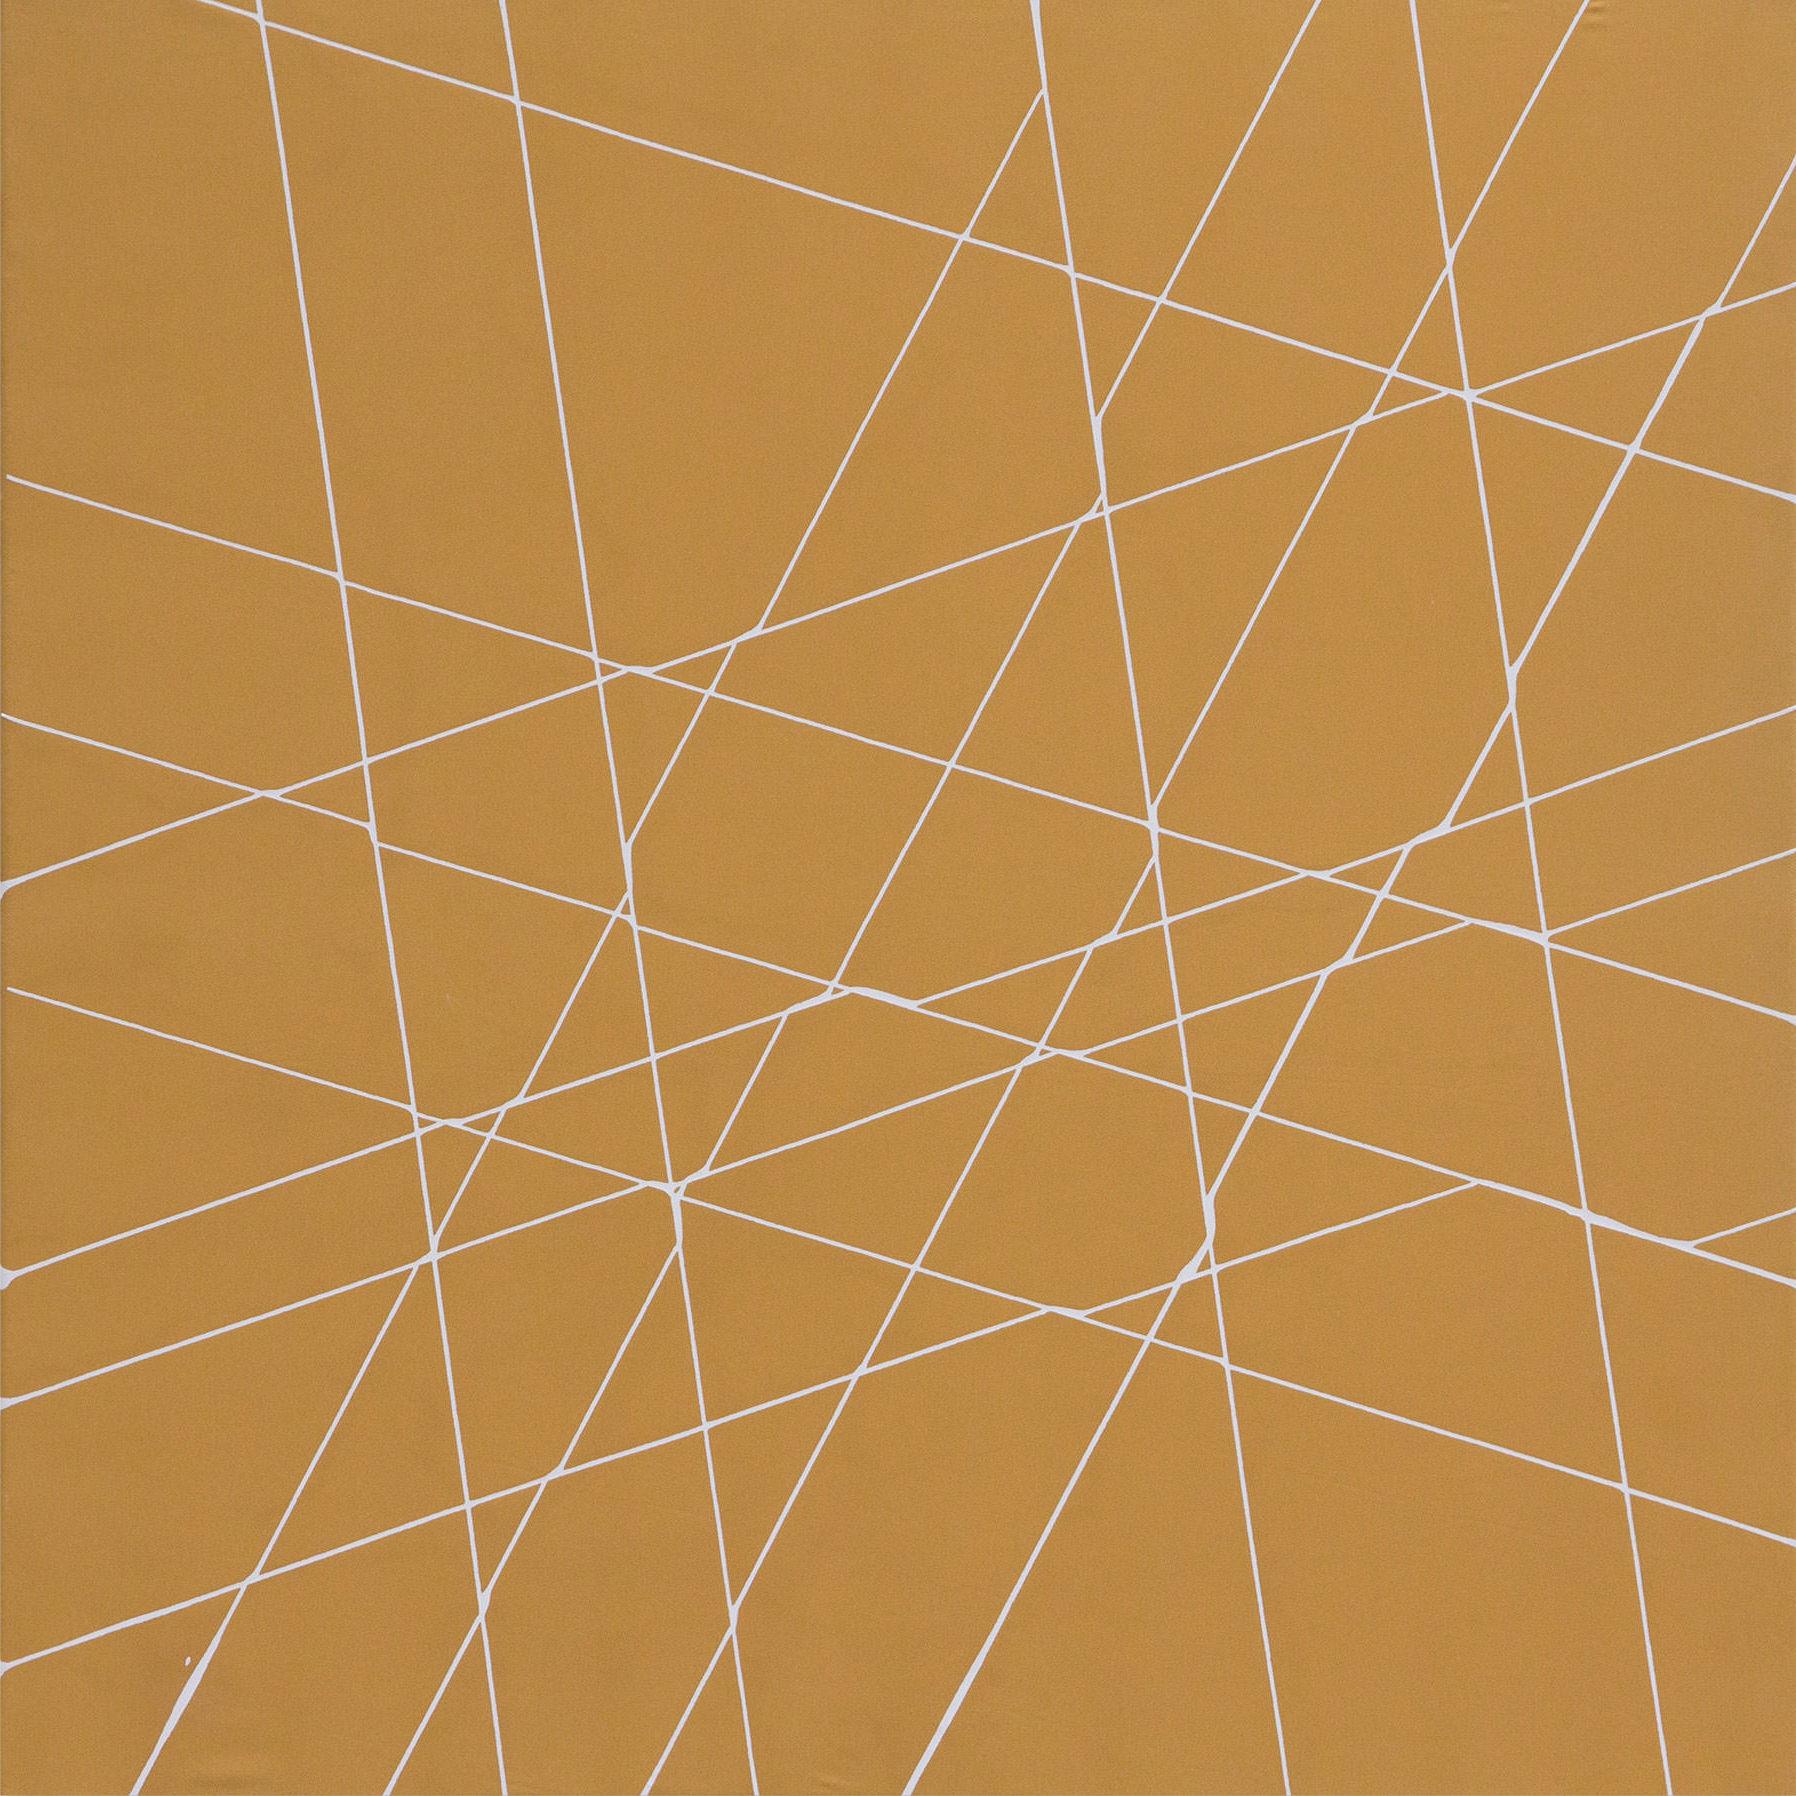 16trail06_acryllack-polyester_70x70cm